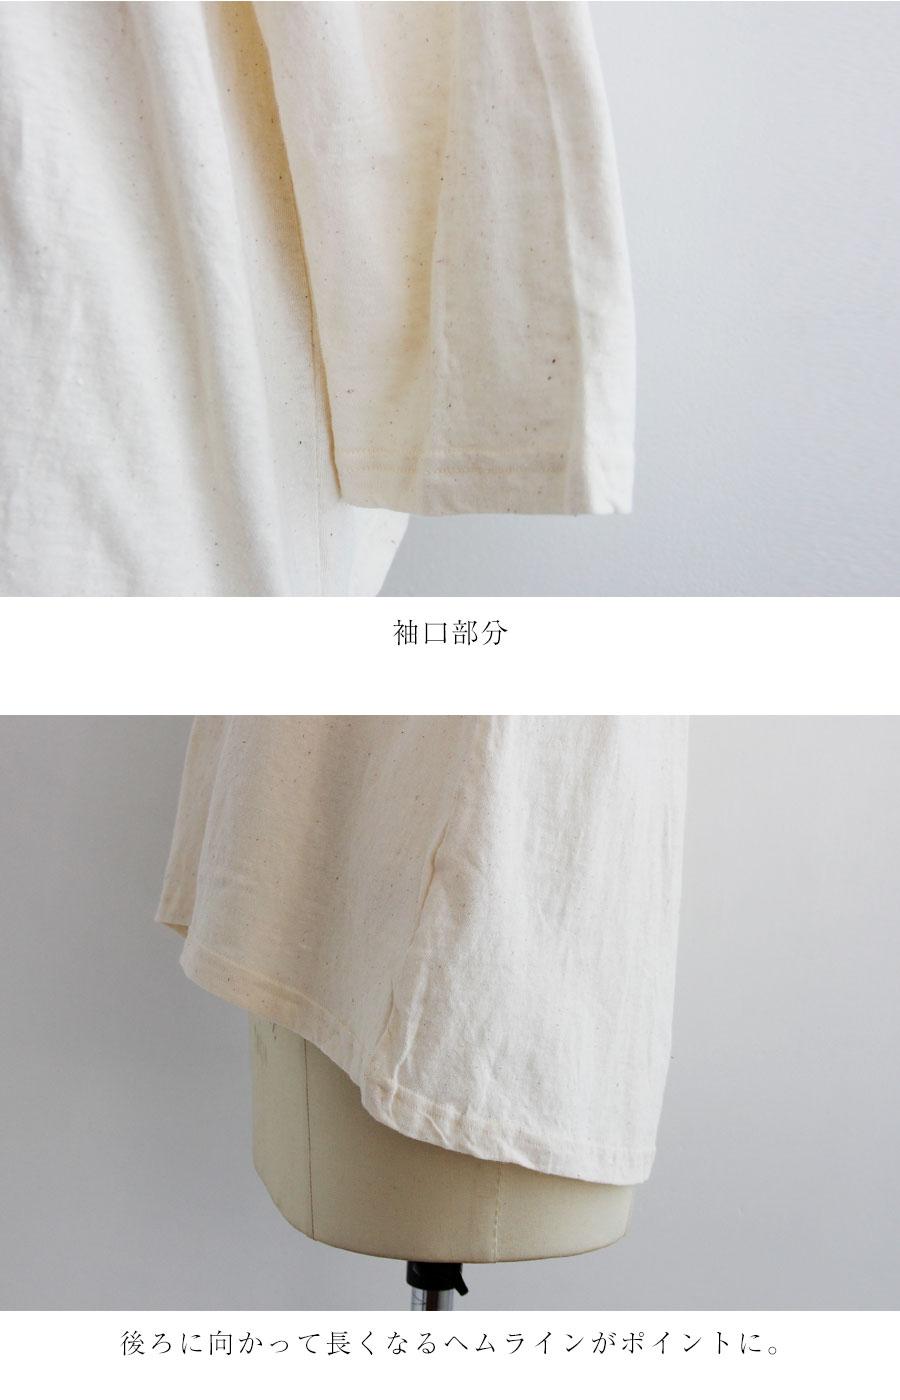 【NARU ナル】ムラ糸 リサイクル 天竺 ワイド プルオーバー カットソー (615001)